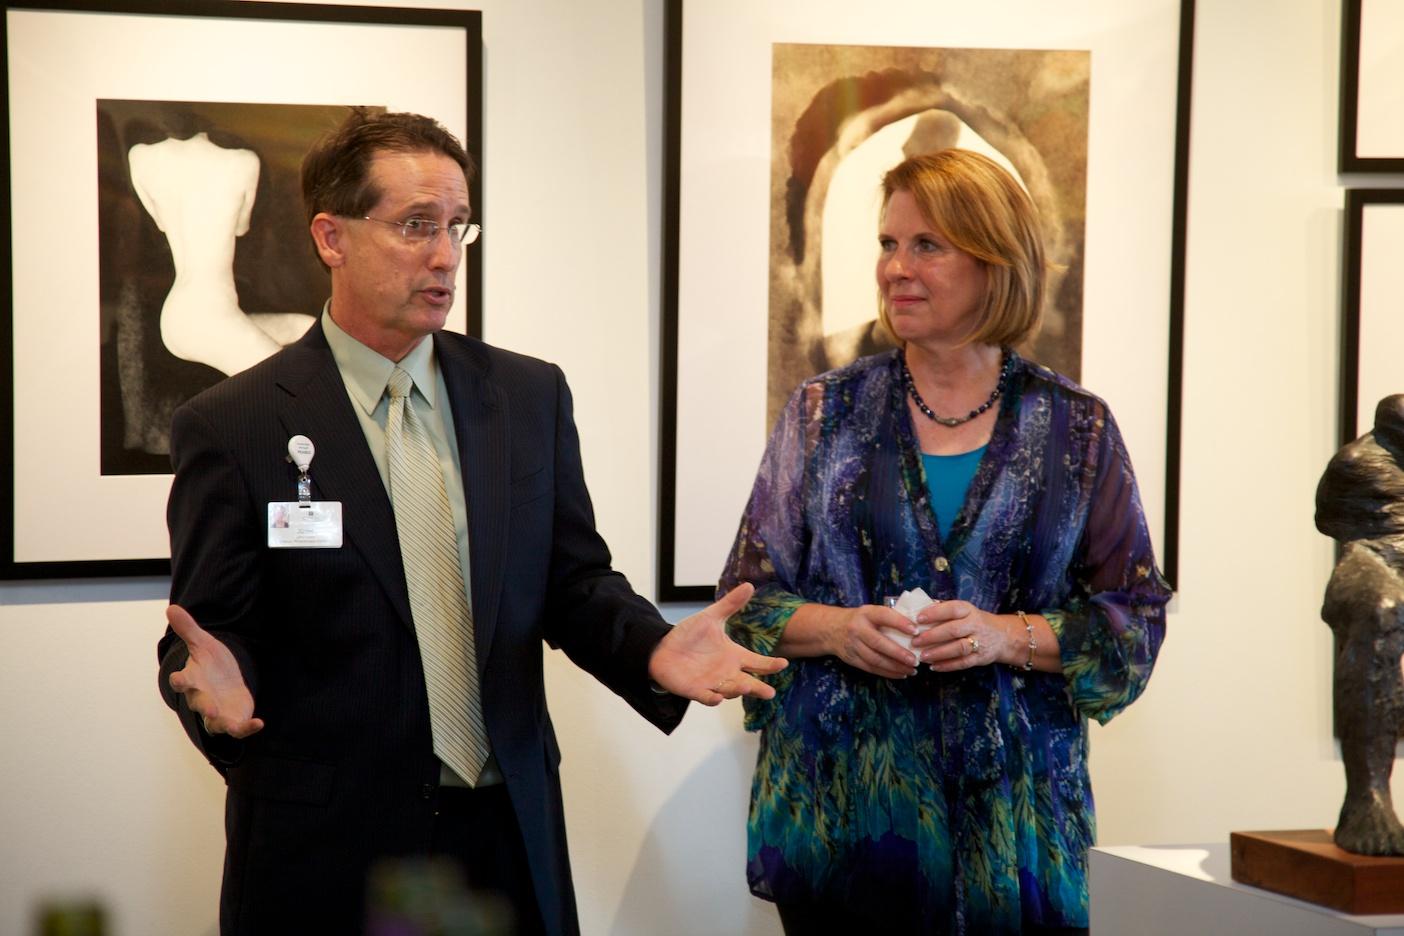 Mission Foundation Director of Philanthropic Initiatives, John Locke and Gallery President, Margaret Offermann